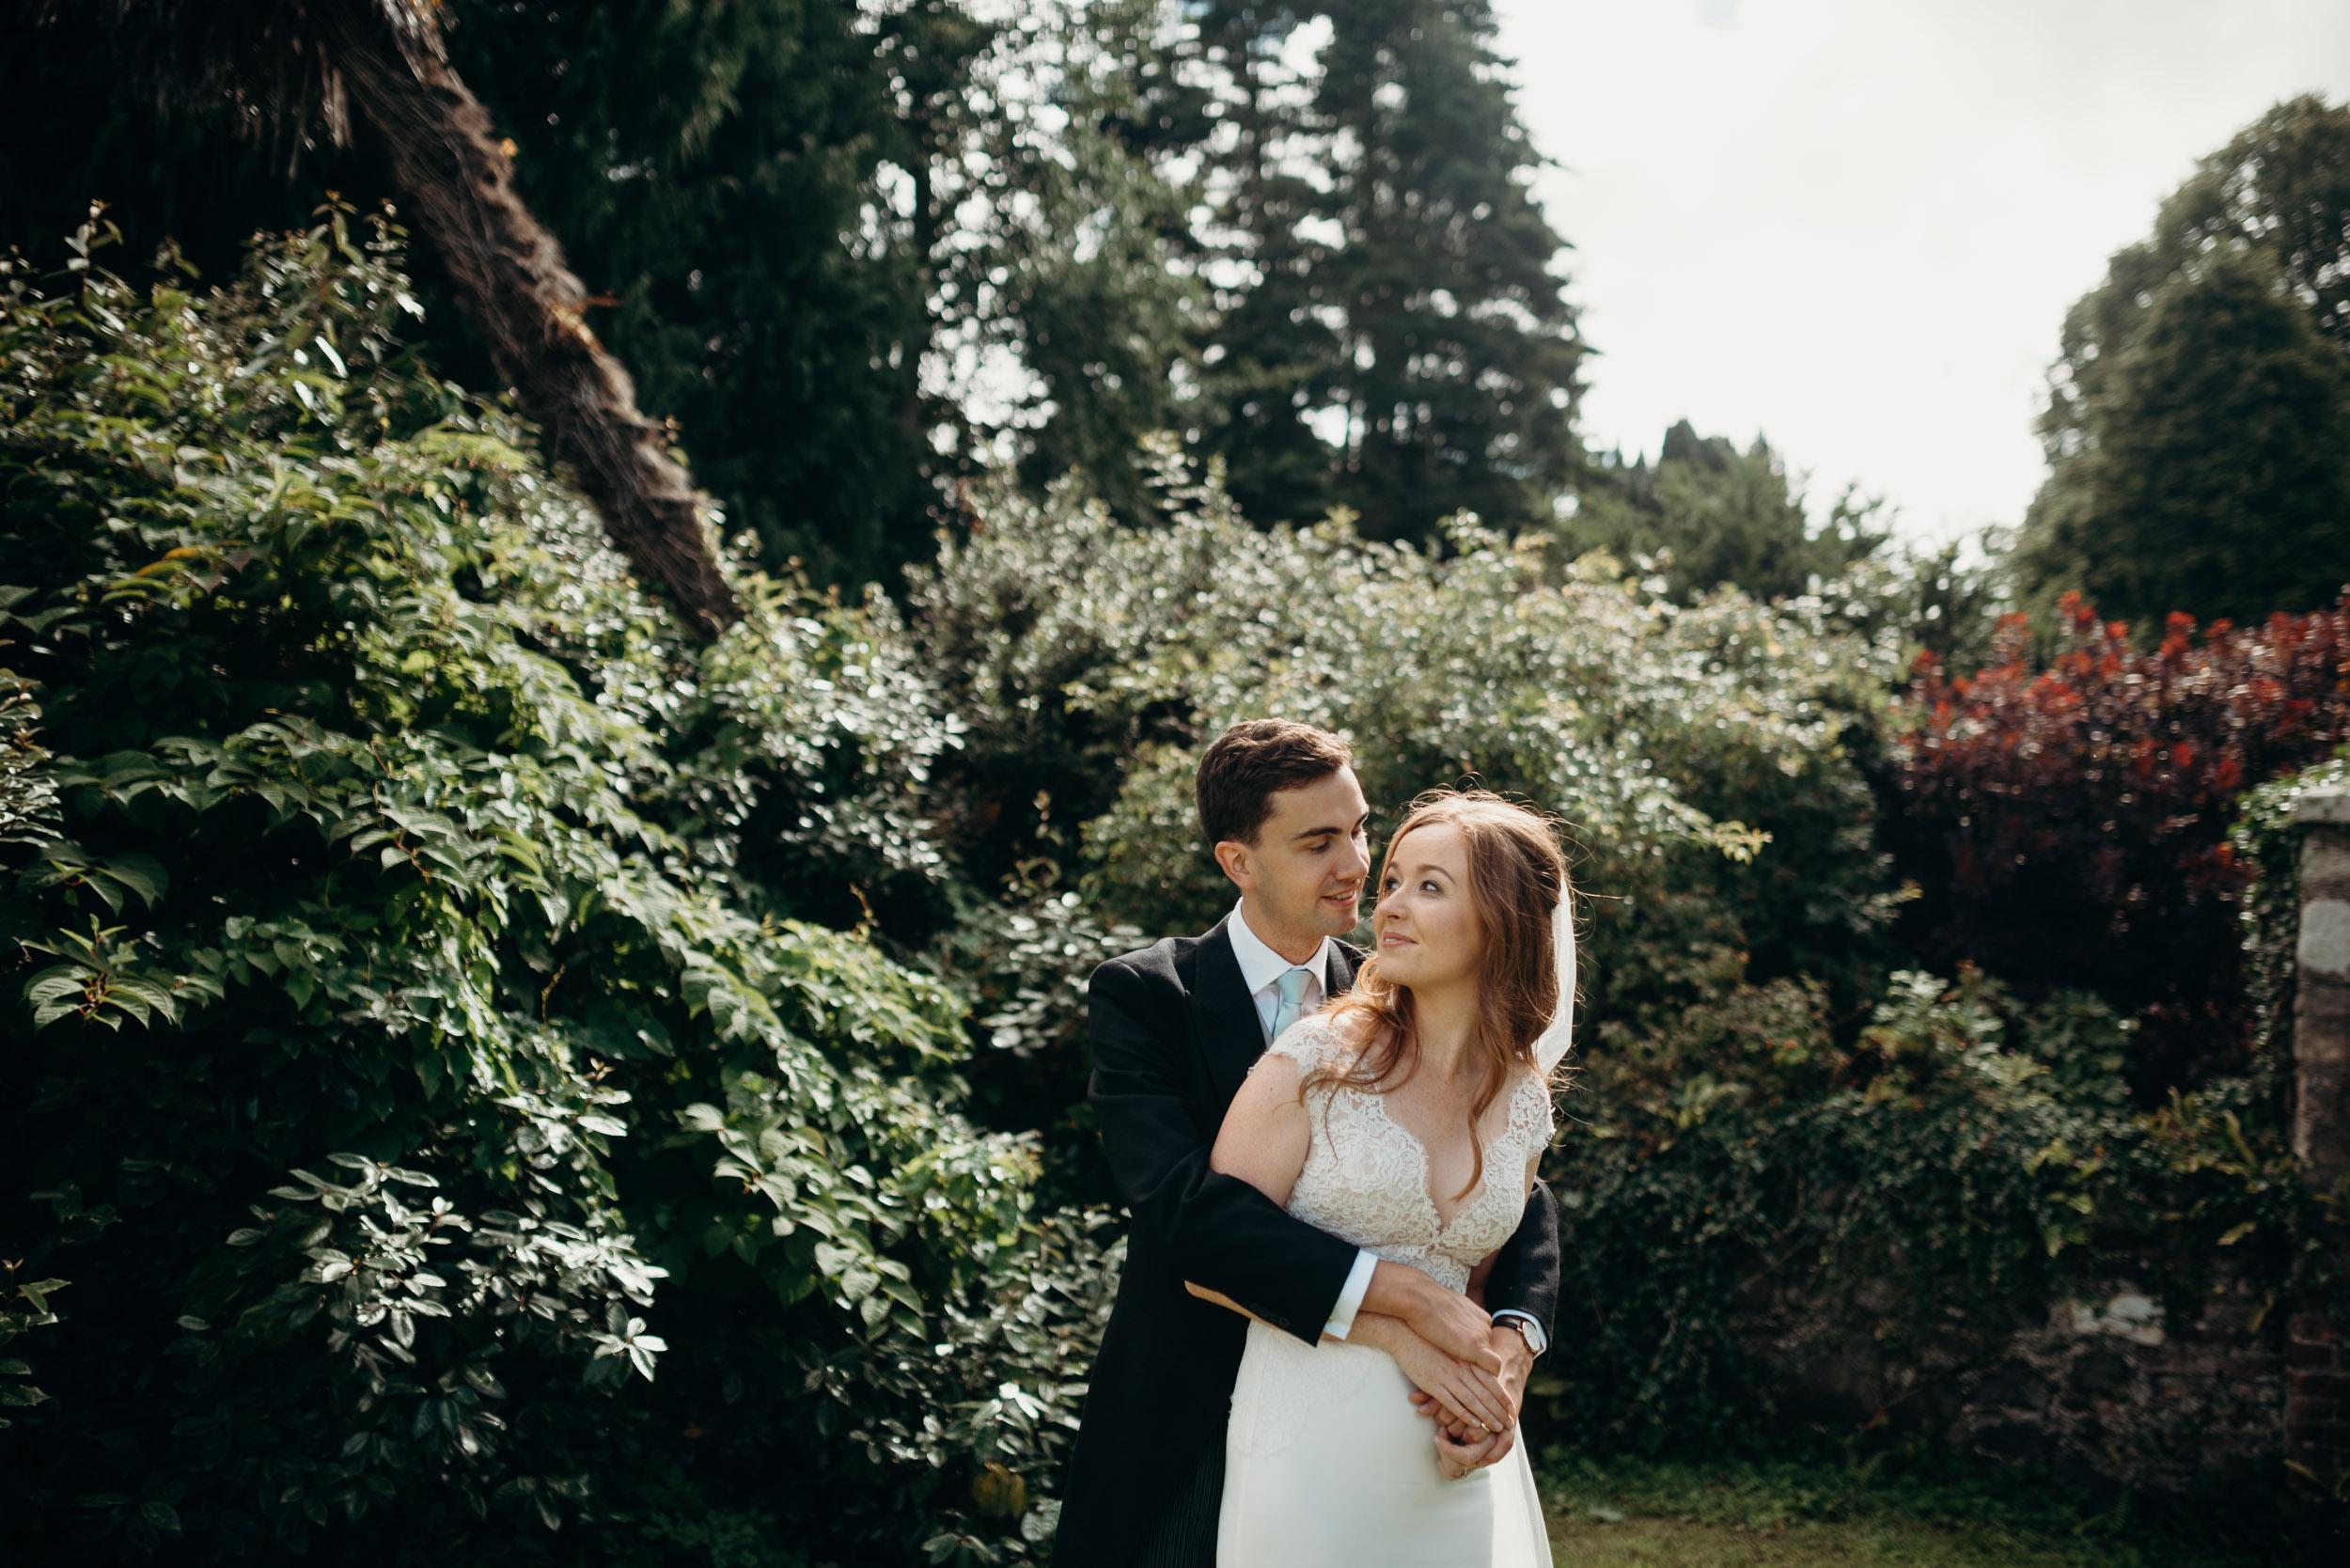 drenagh estate wedding photography-88.jpg